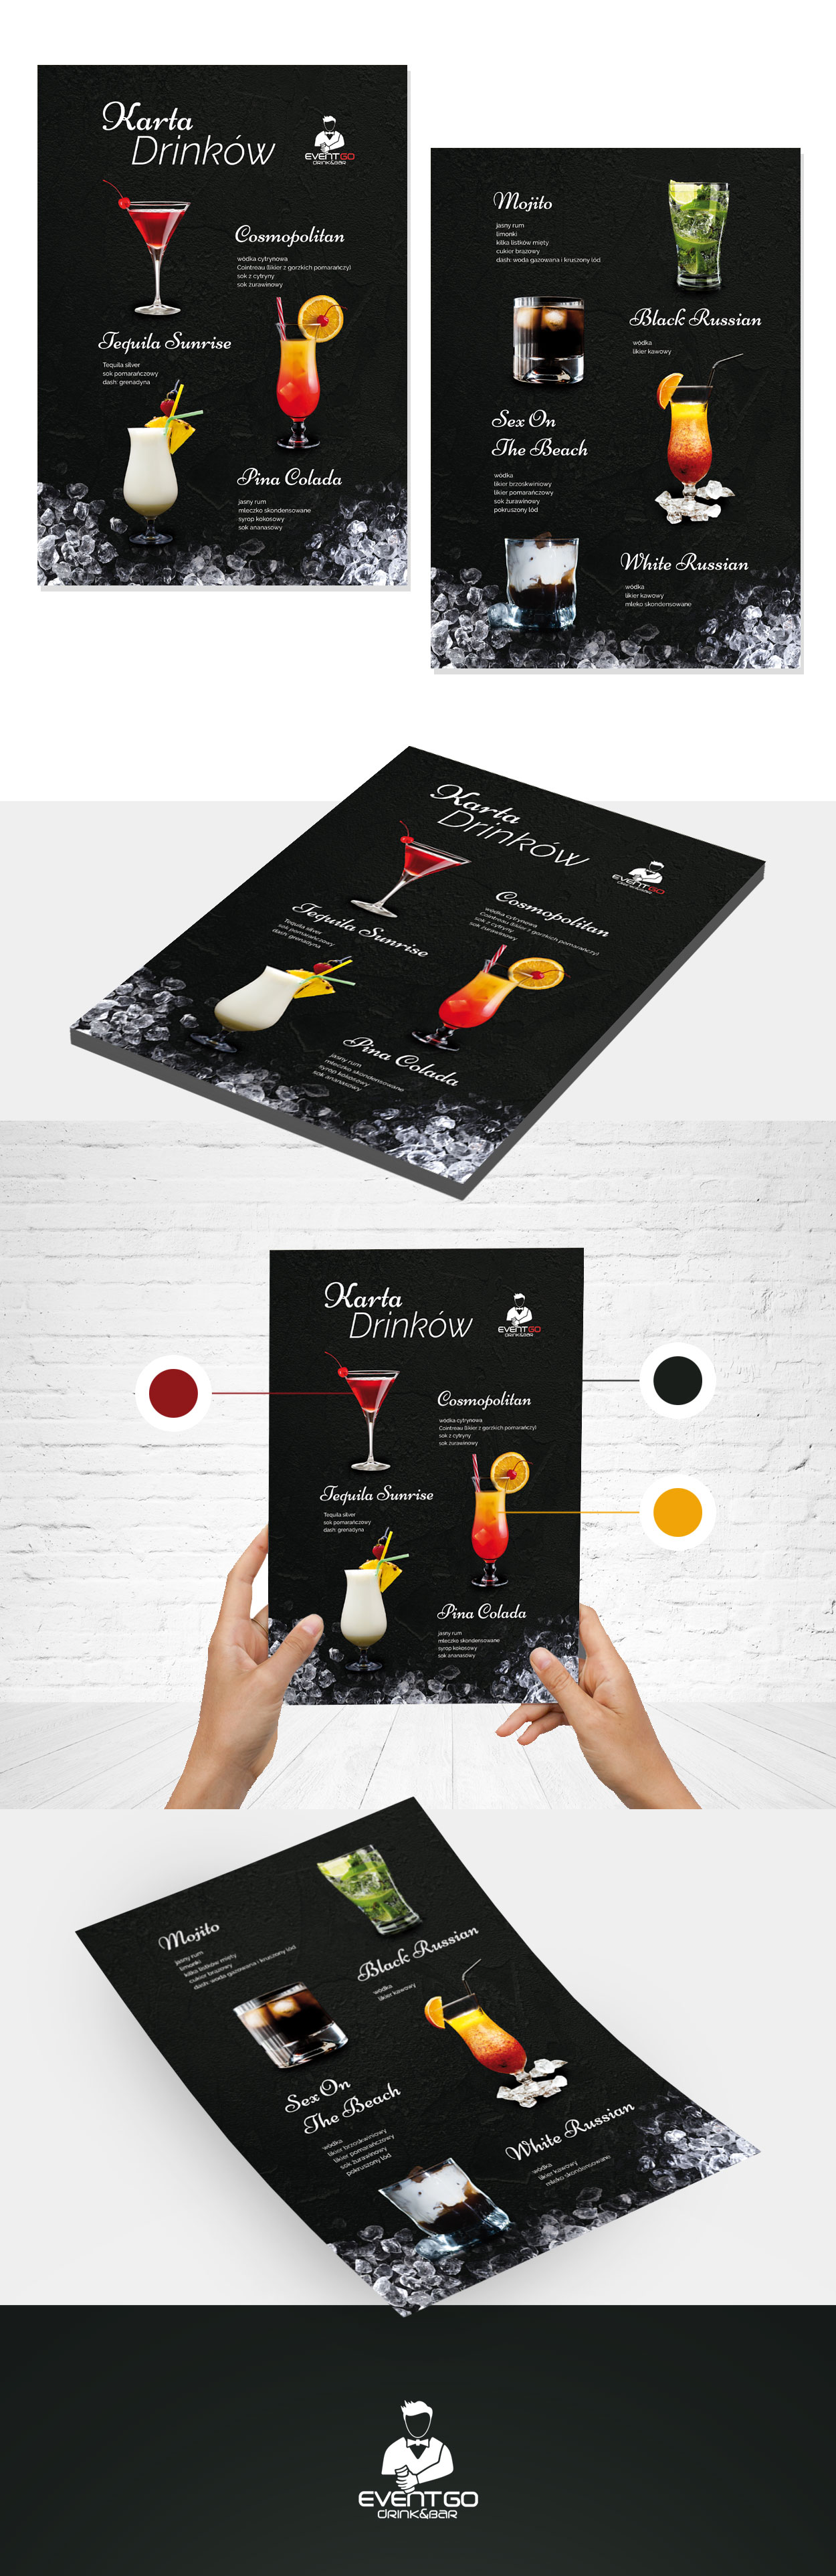 karta-menu-drinkow-projekt-eventgo